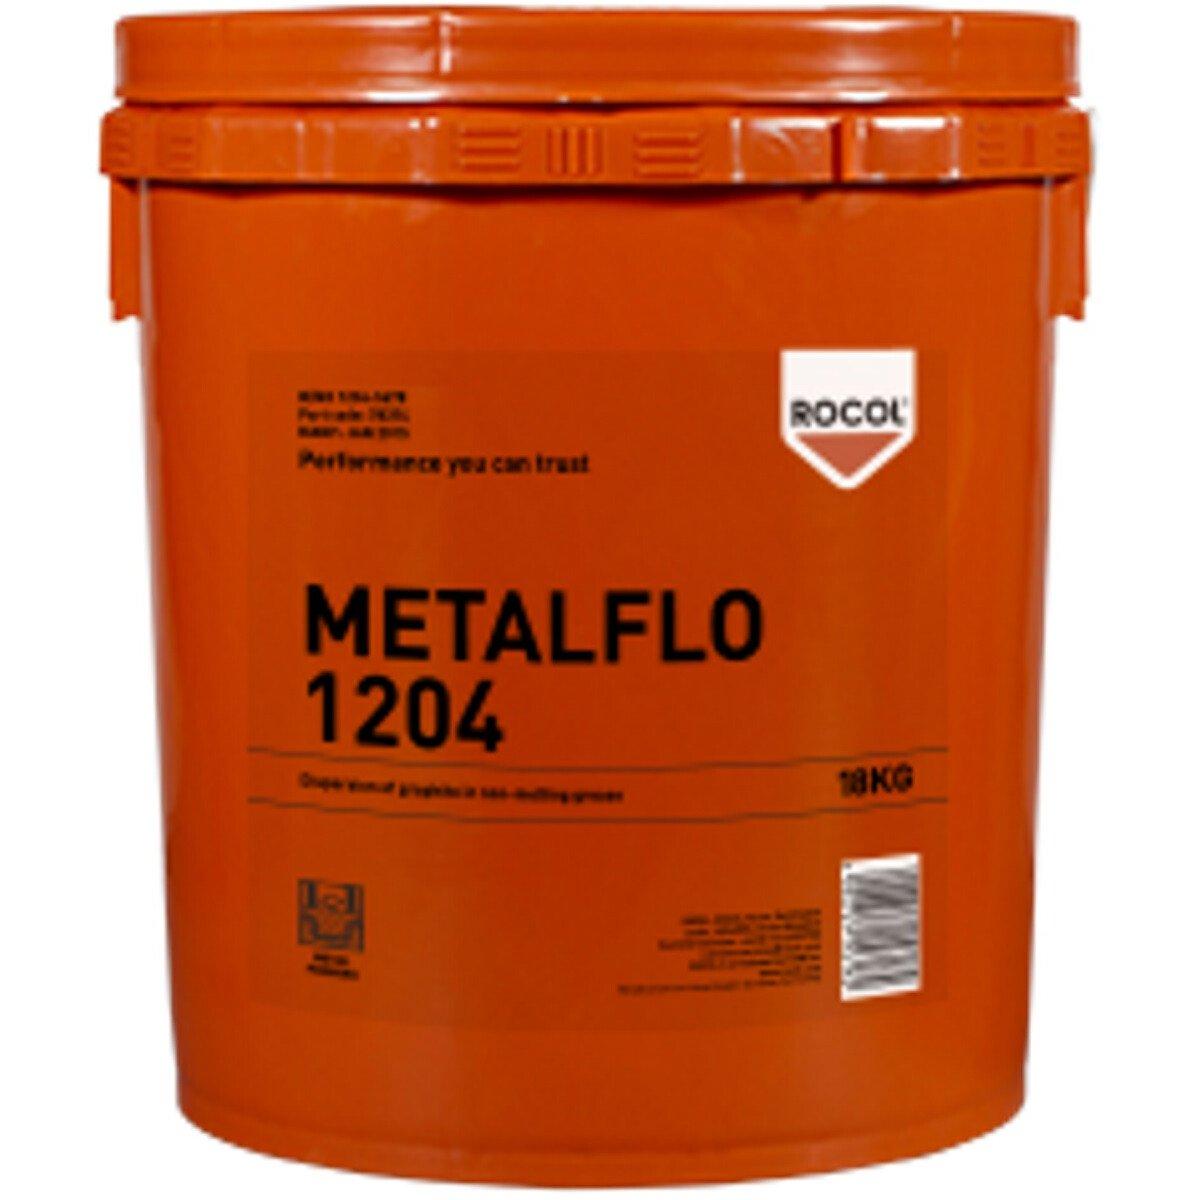 Rocol 78374 Metalflo 1204 - Dispersion of Graphite in Non Melting Grease 18kg